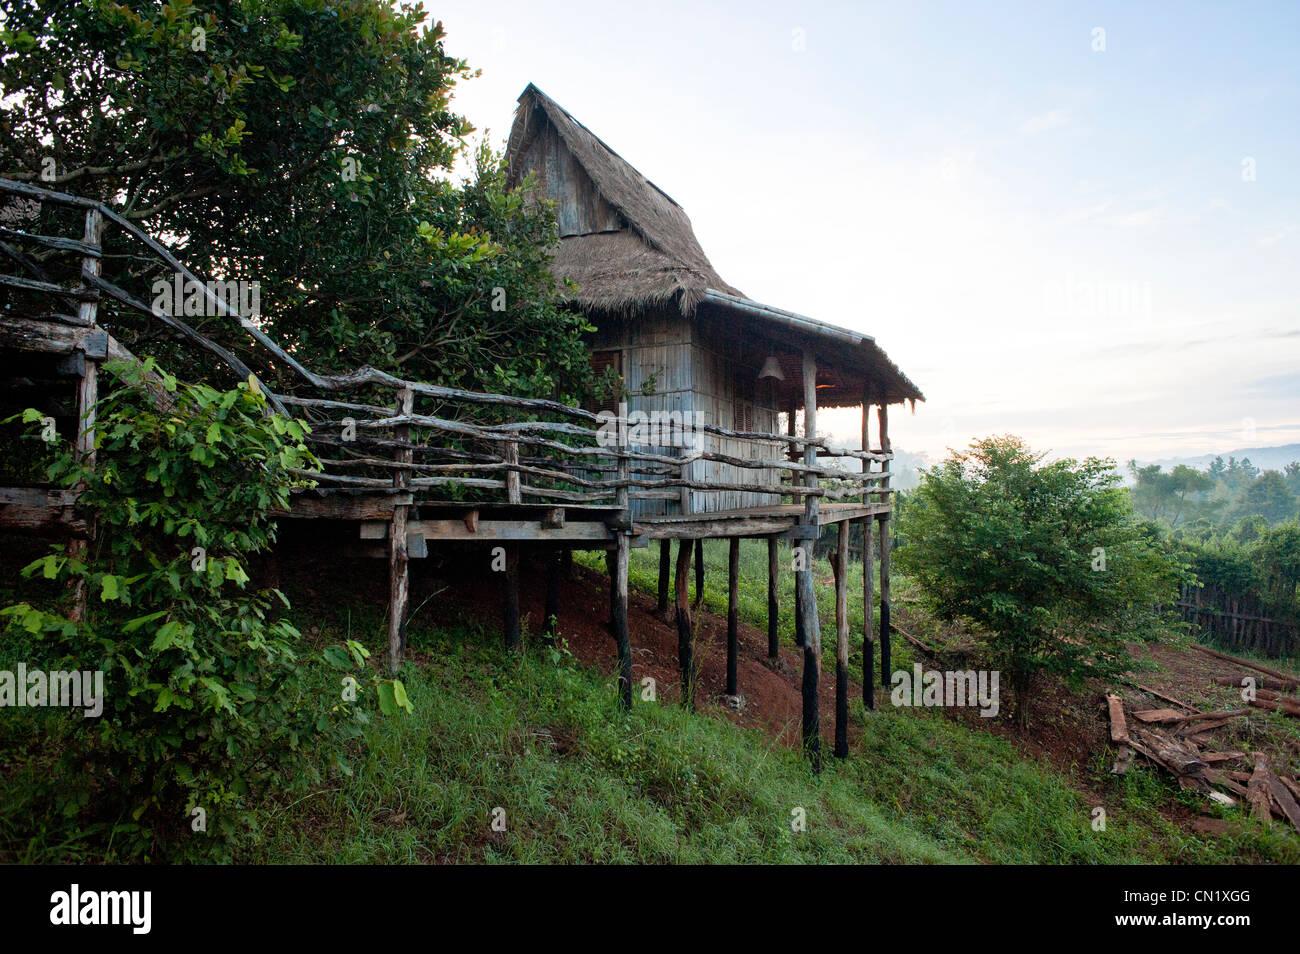 Cambodia, Ratanakiri Province, Banlung (Ban Lung), Tree Top Ecolodge - Stock Image